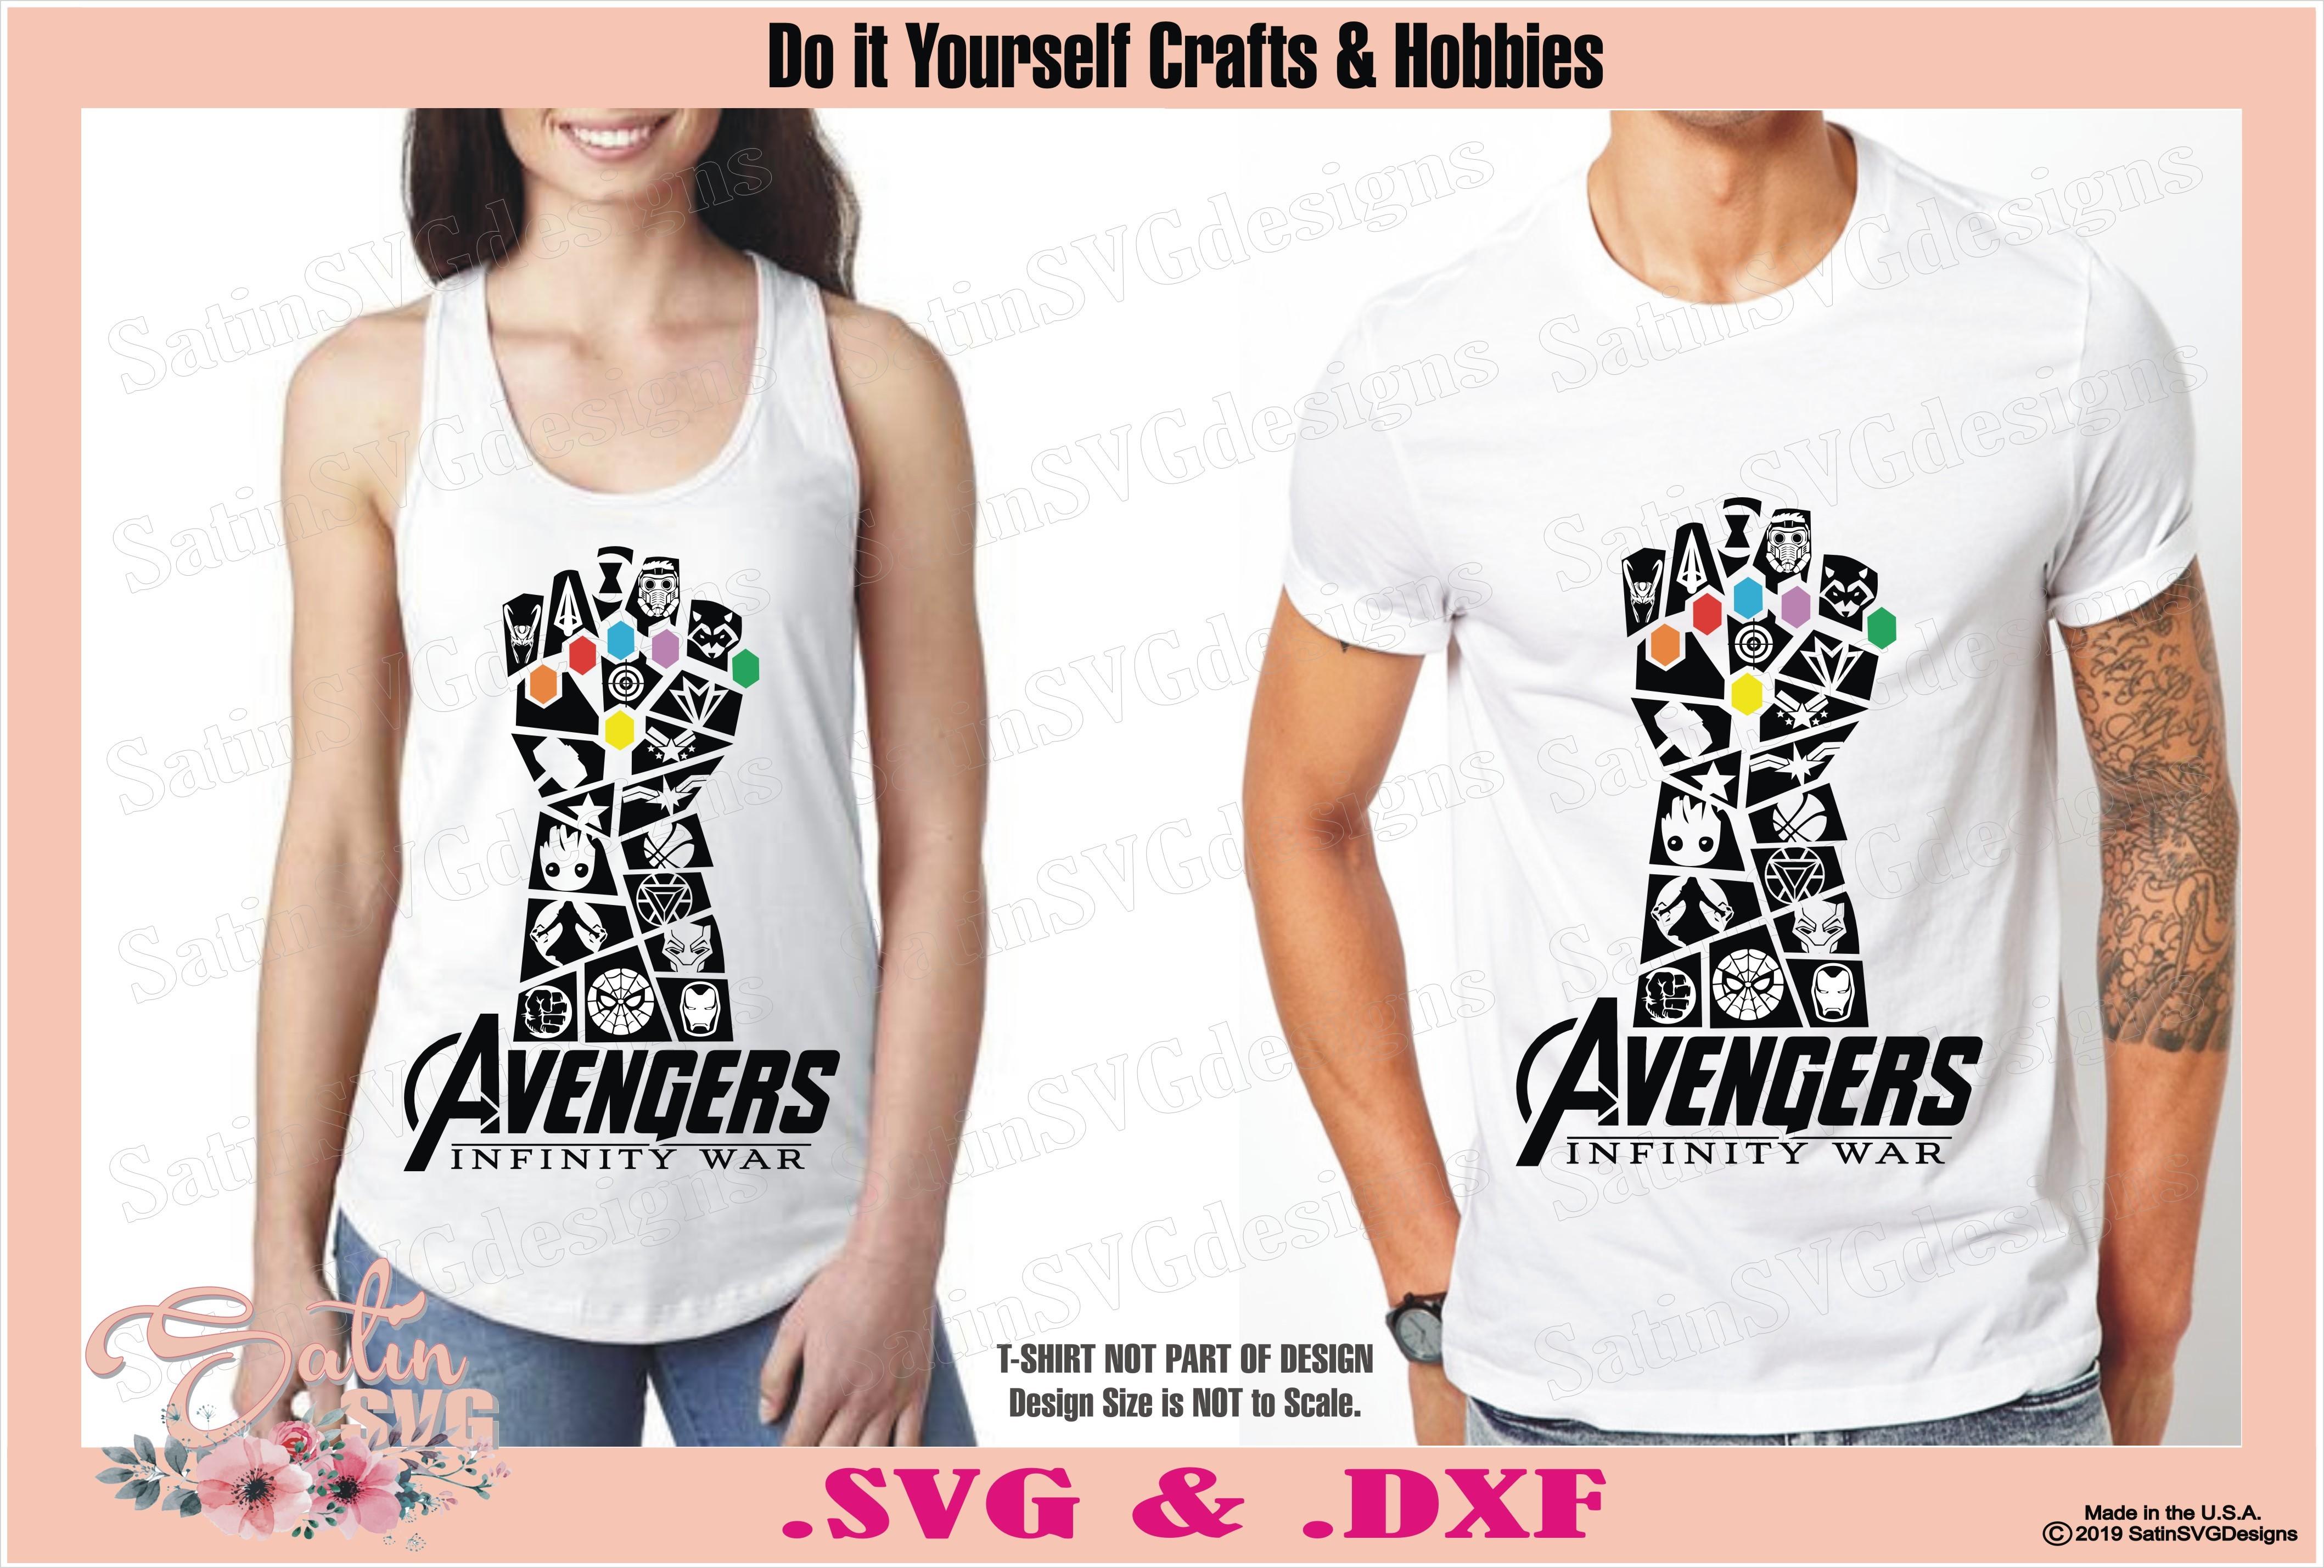 Avengers Infinity War End Game Thanos Glove Marvel Design SVG Files,  Cricut, Silhouette Studio, Digital Cut Files